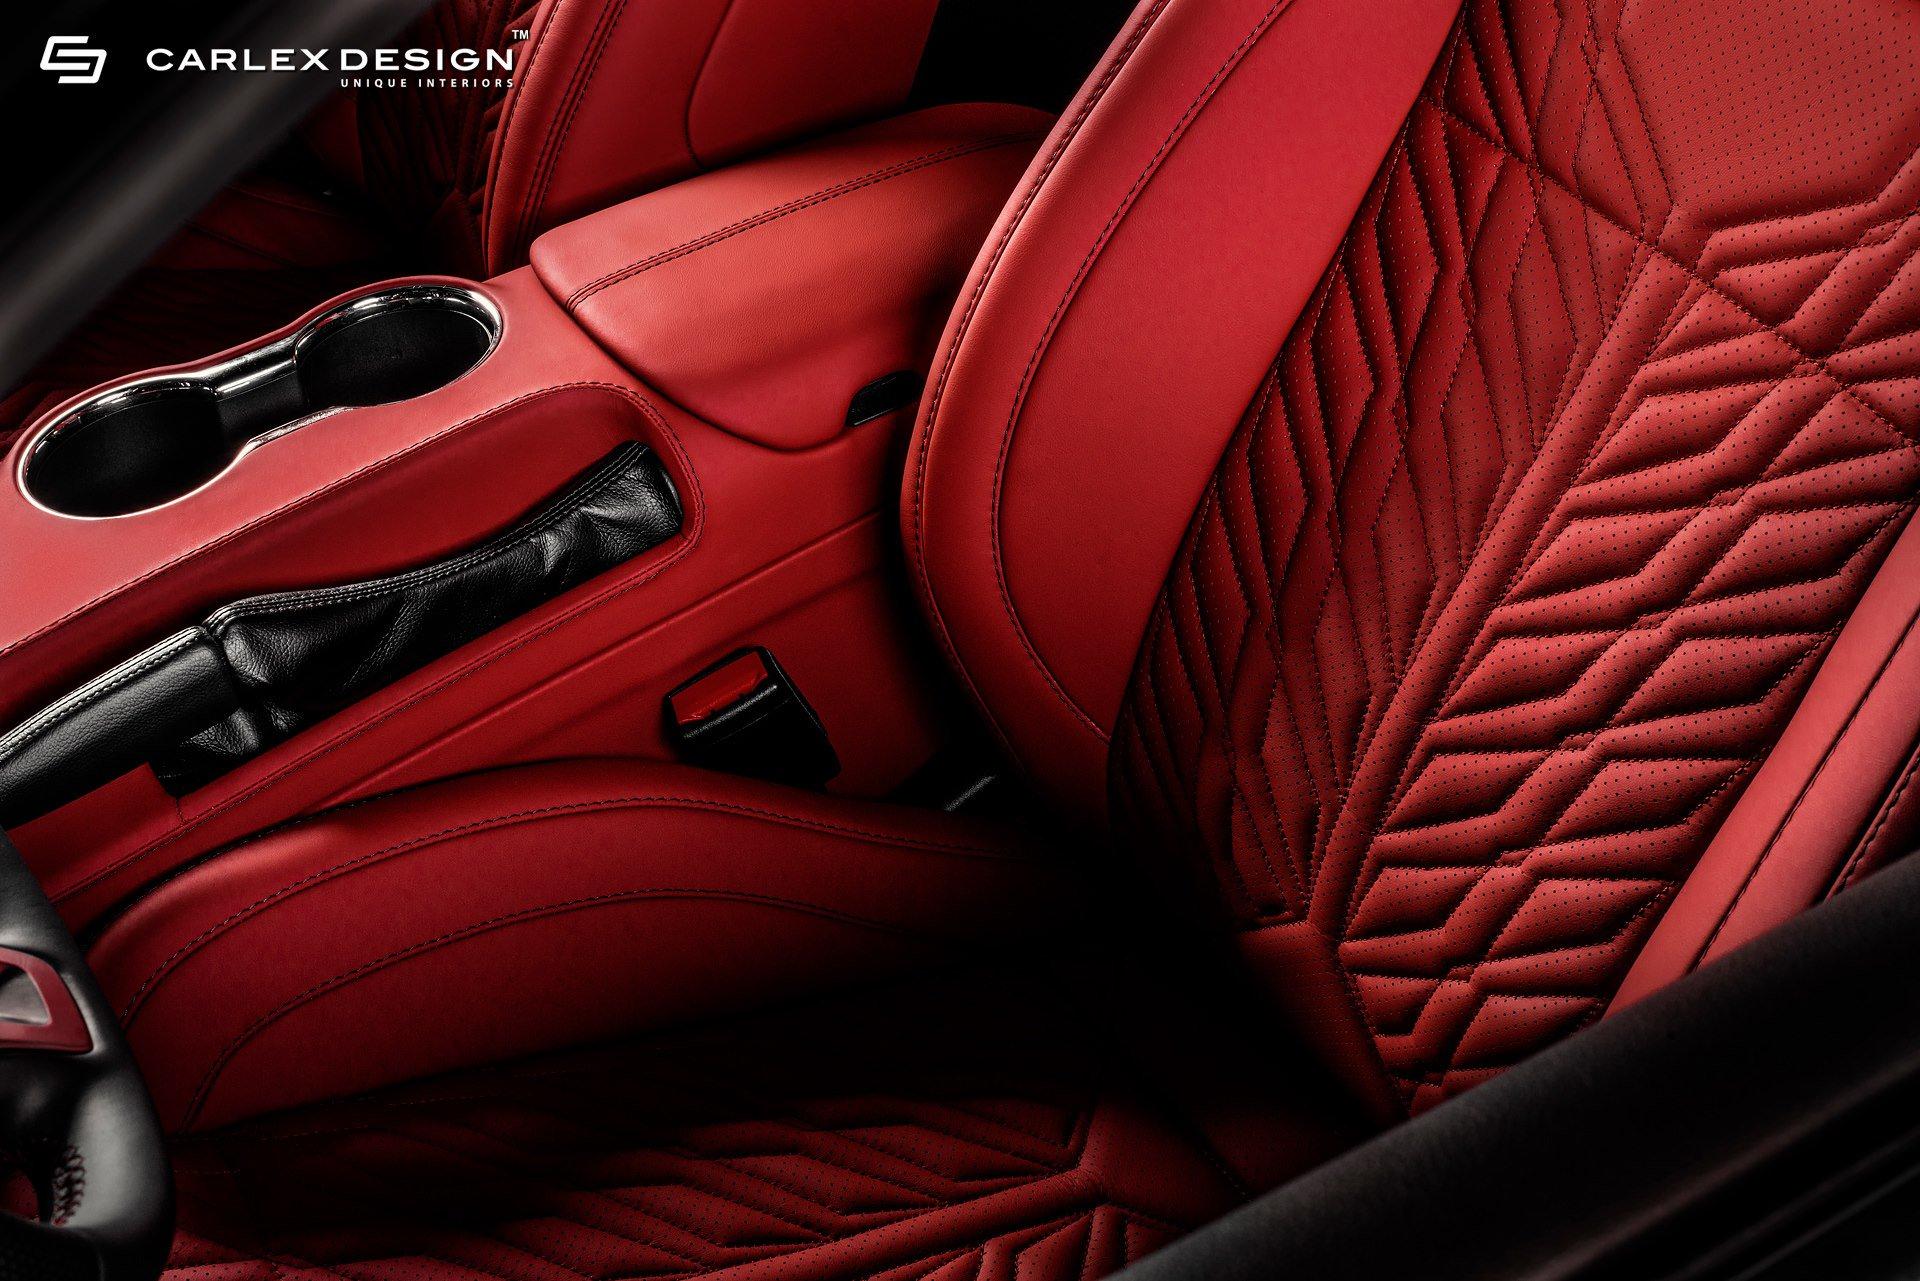 a61d41ca-carlex-mustang-red-interior-3